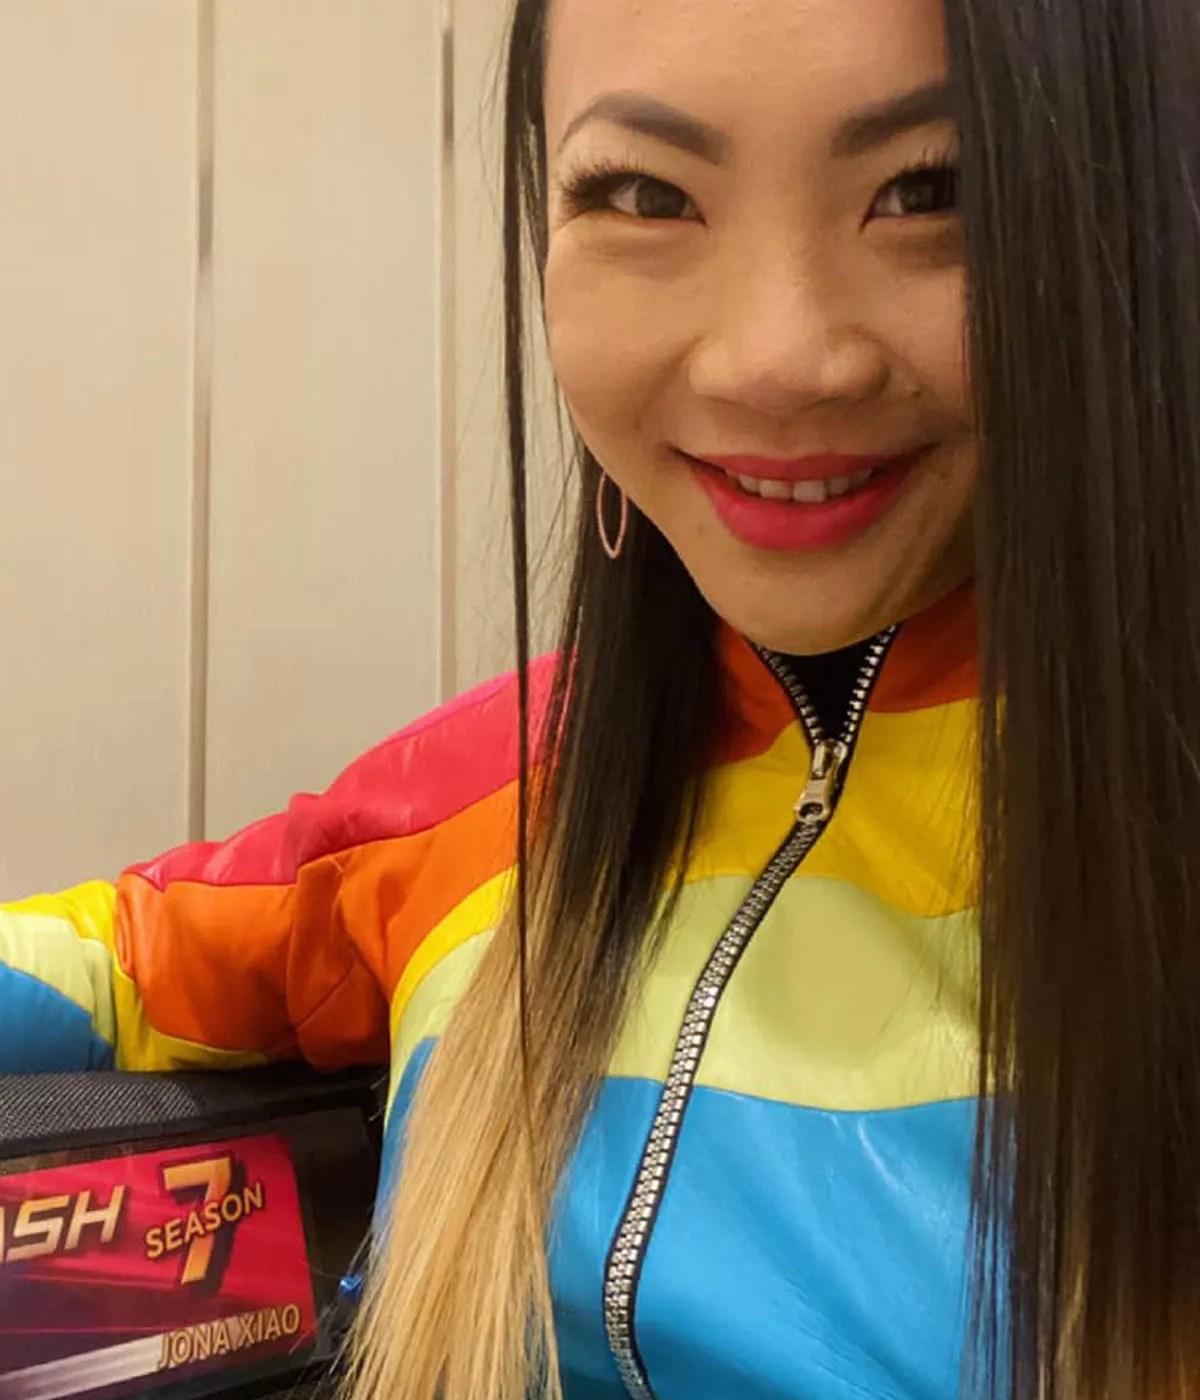 carrie-bates-the-flash-season-07-jona-xiao-the-jacket